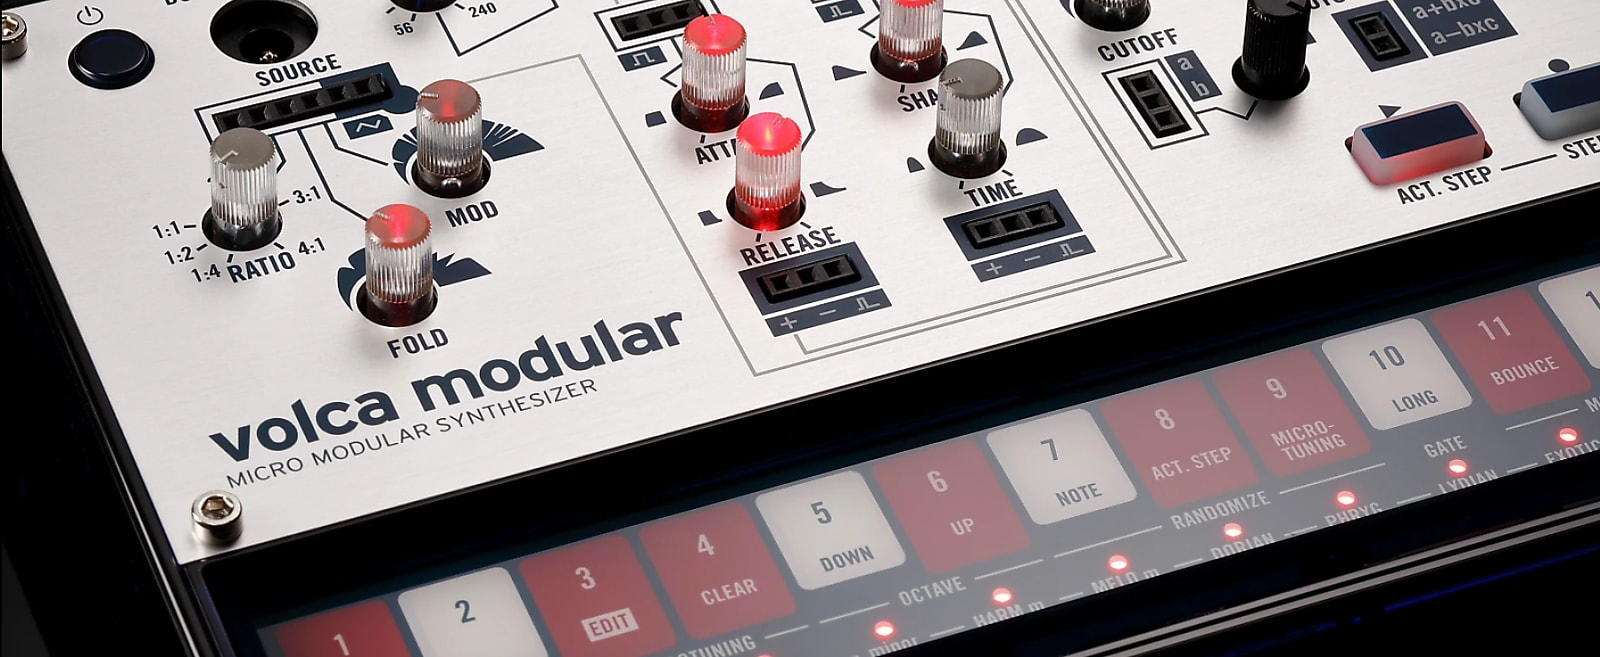 korg volca modular micro modular synthesizer reverb. Black Bedroom Furniture Sets. Home Design Ideas